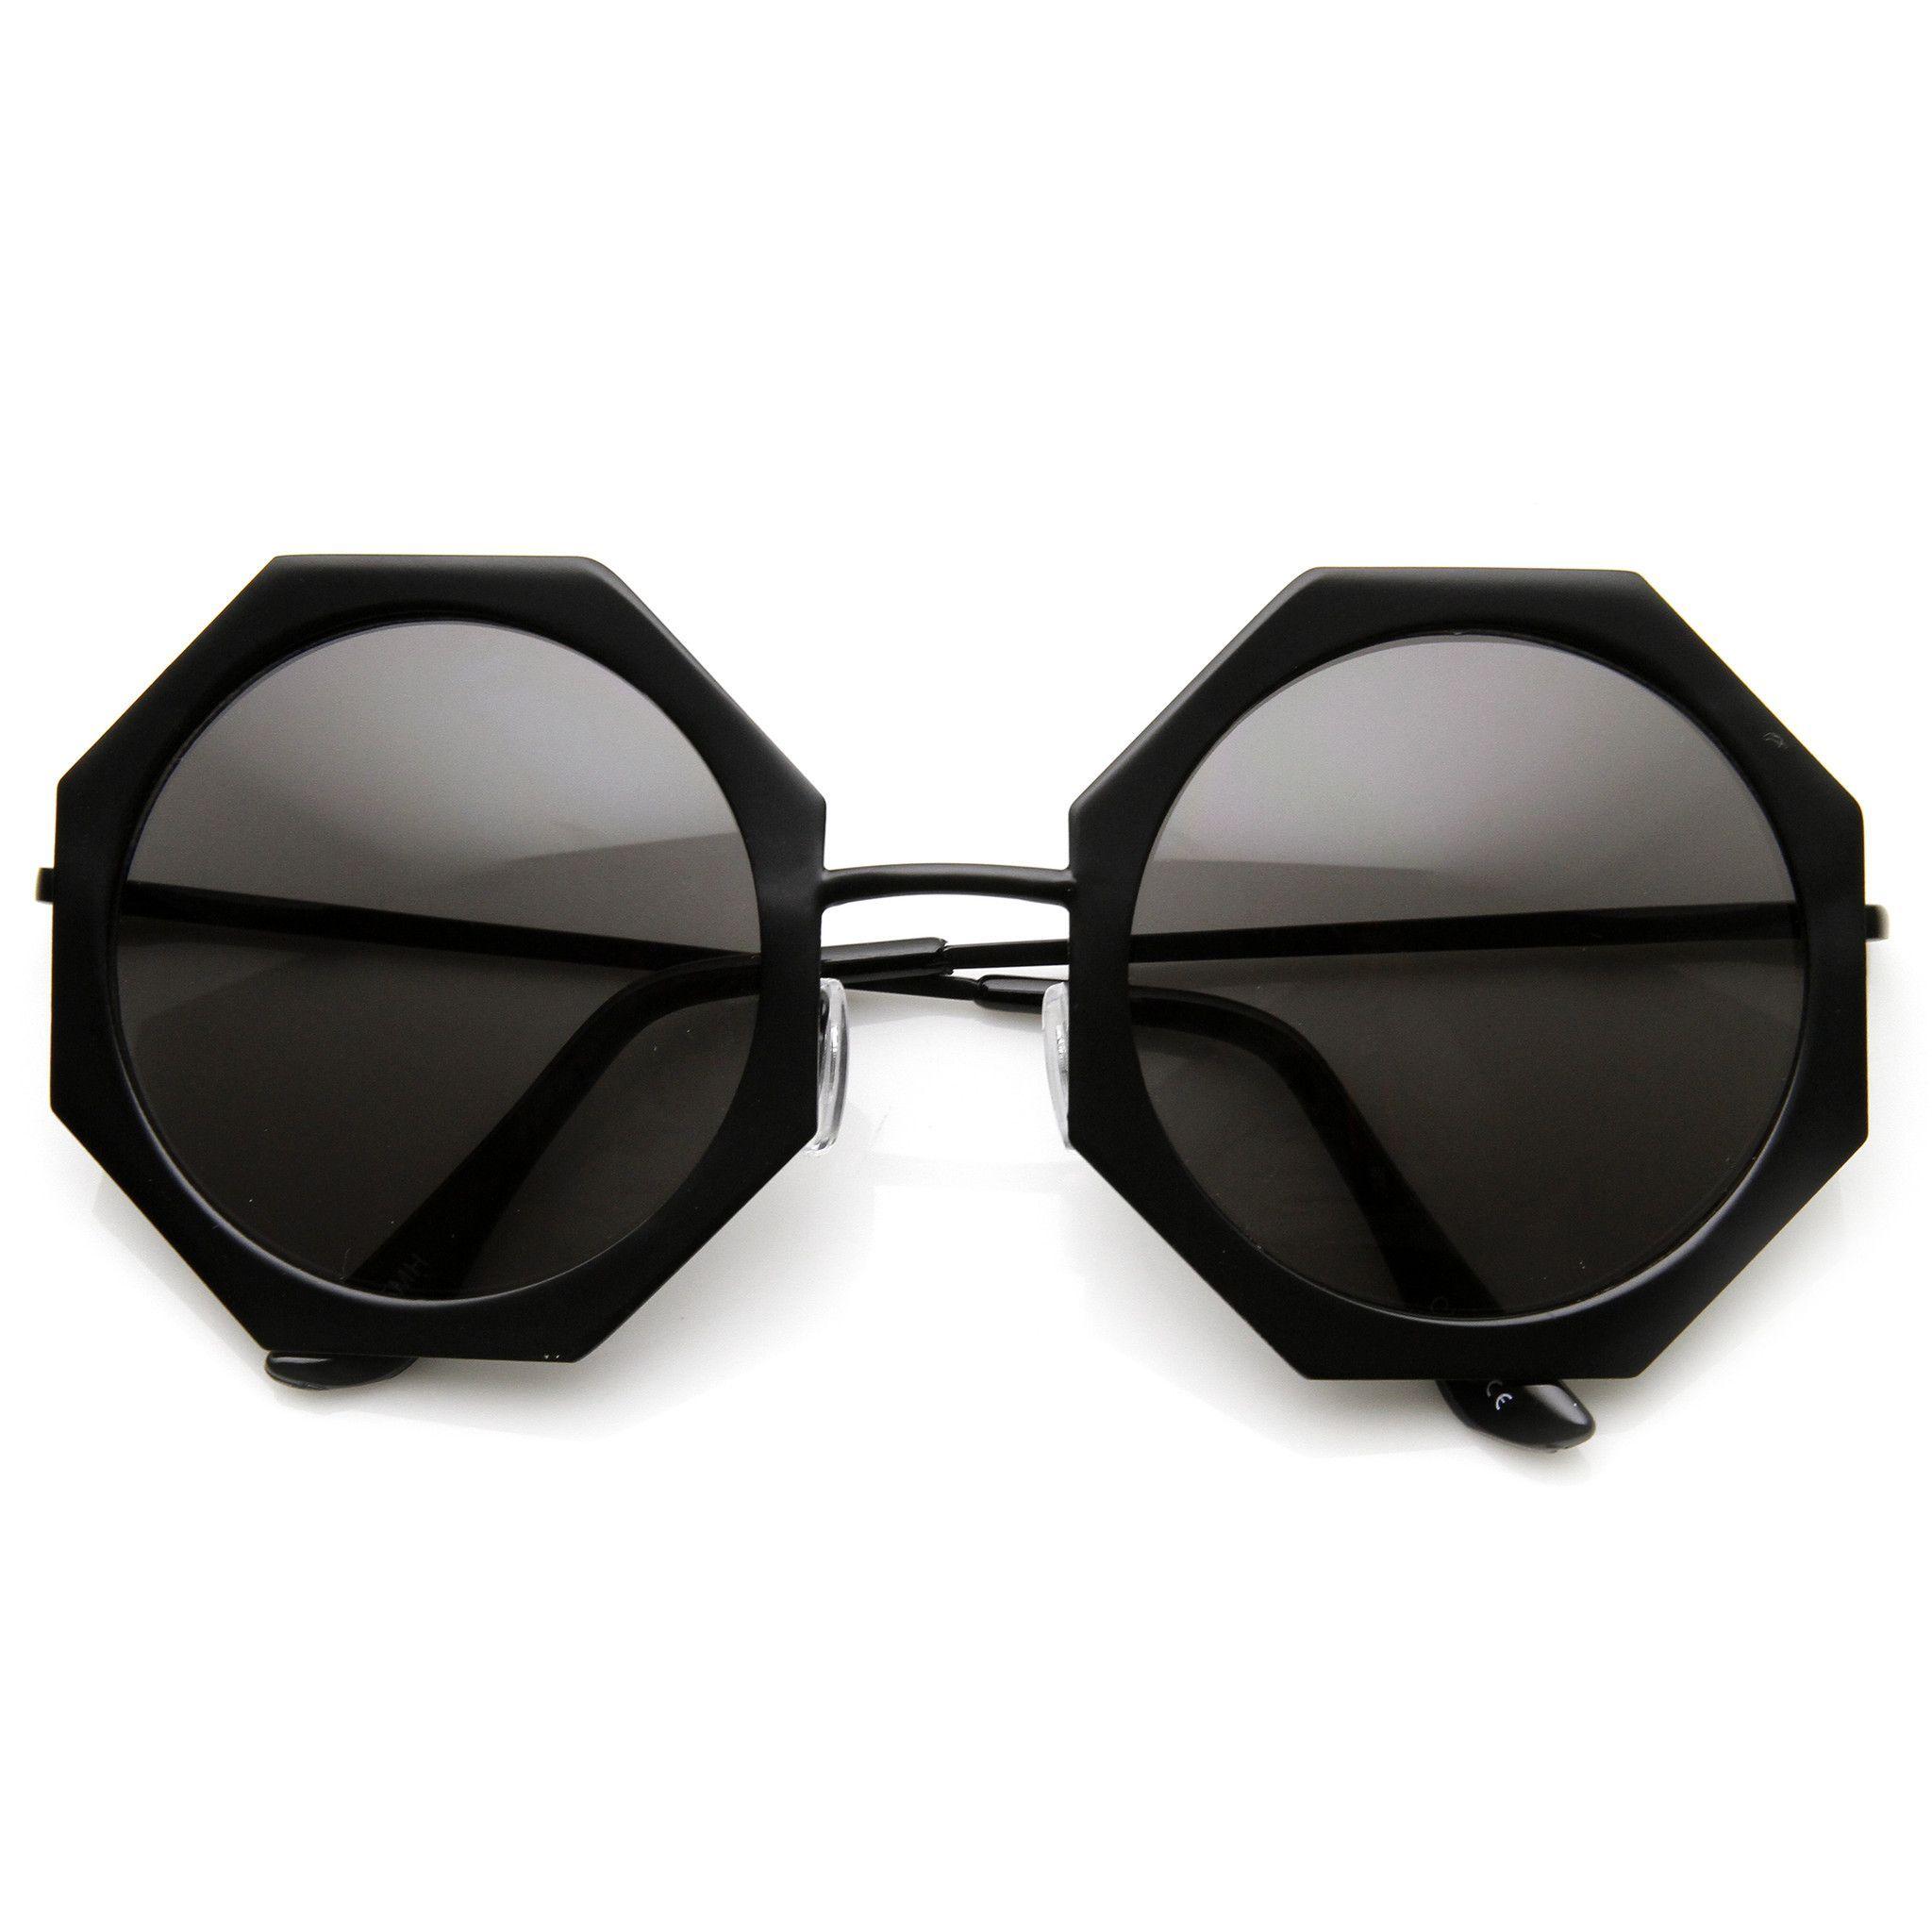 ba22af10172 Womens Oversize Metal Geometric Octagon Round Sunglasses 9316 ...